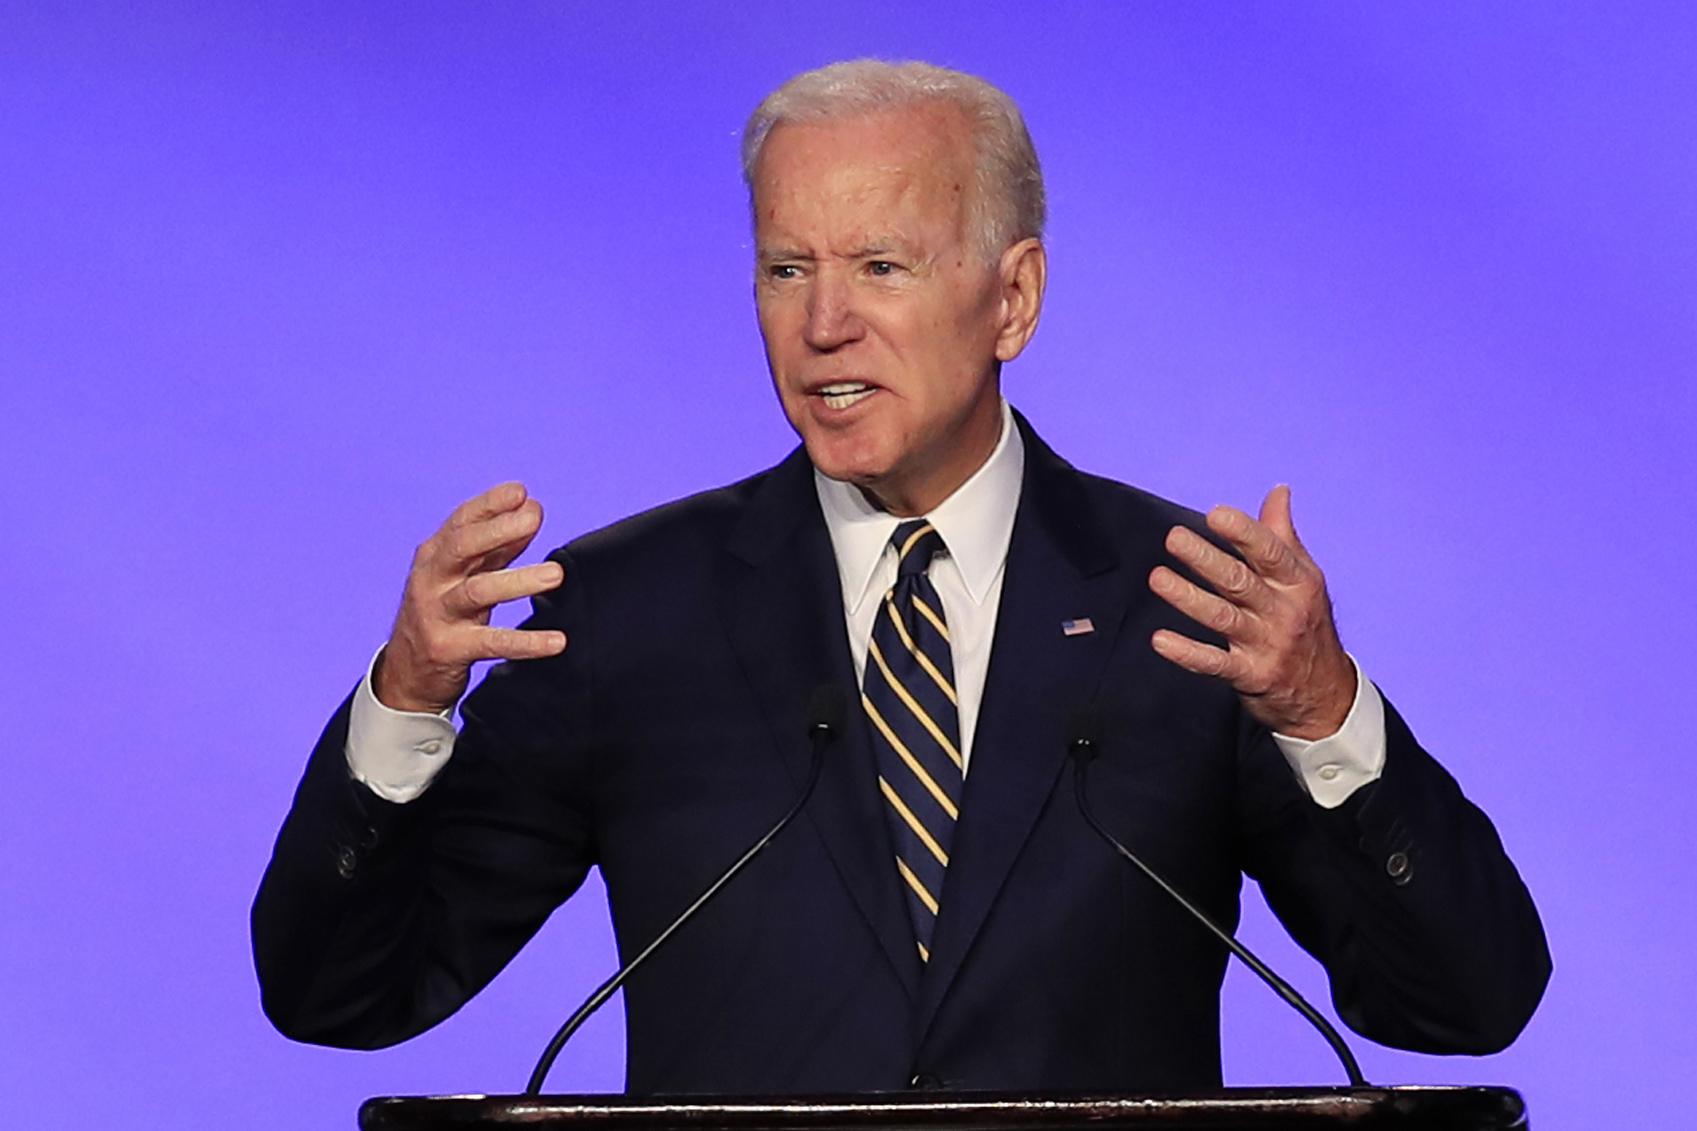 Election_2020_Joe_Biden_51589-159532.jpg04635866